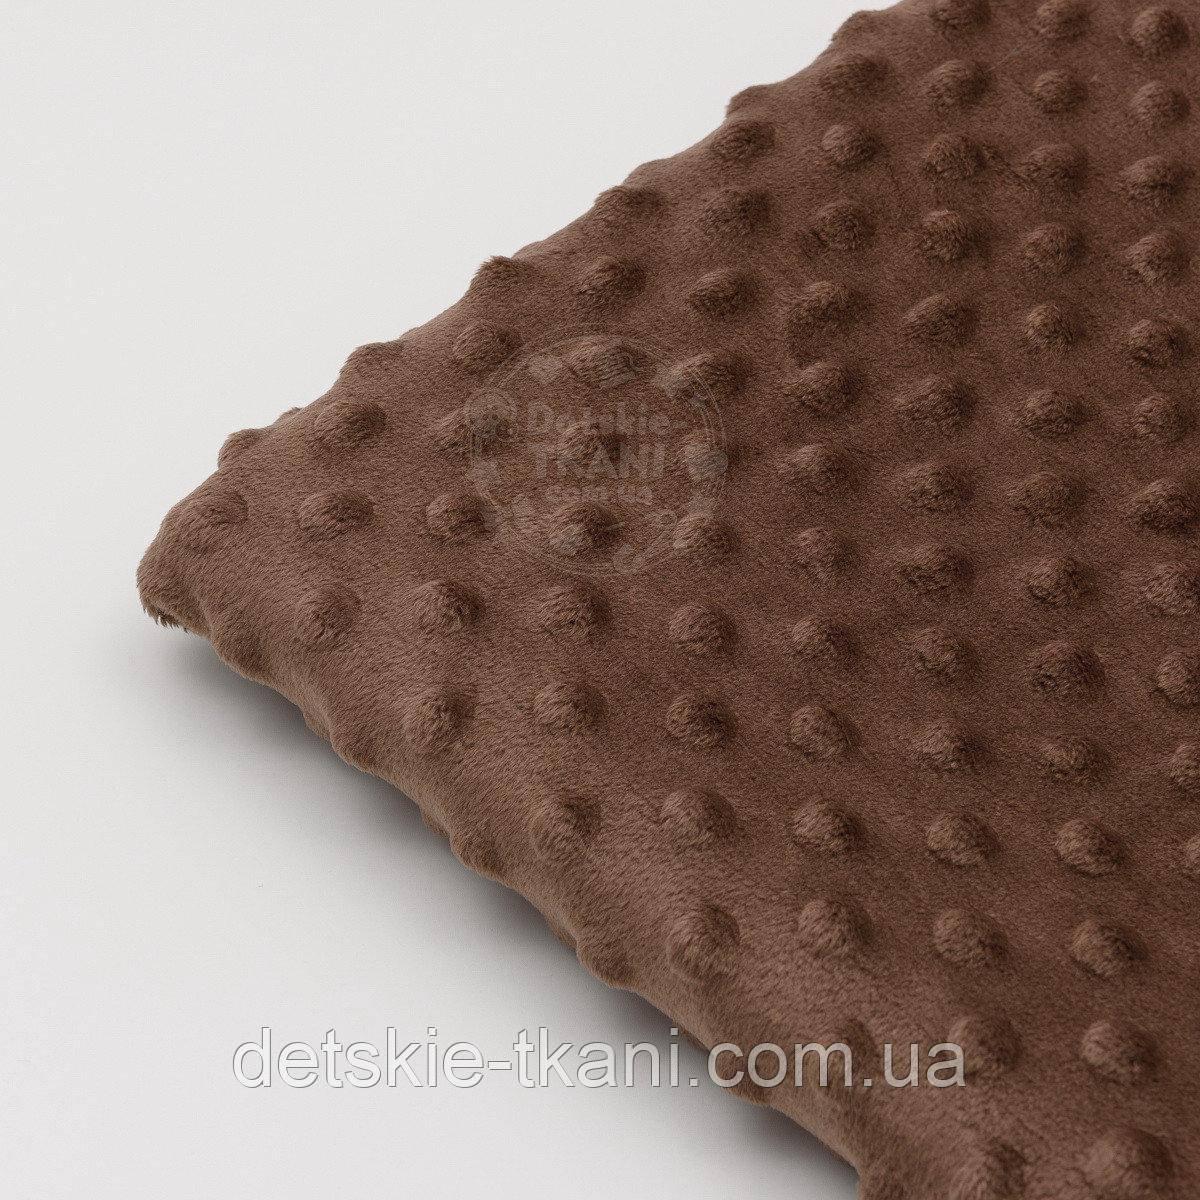 Два лоскута плюша minky М-16  коричневого цвета, размер 65*25, 45*25 см